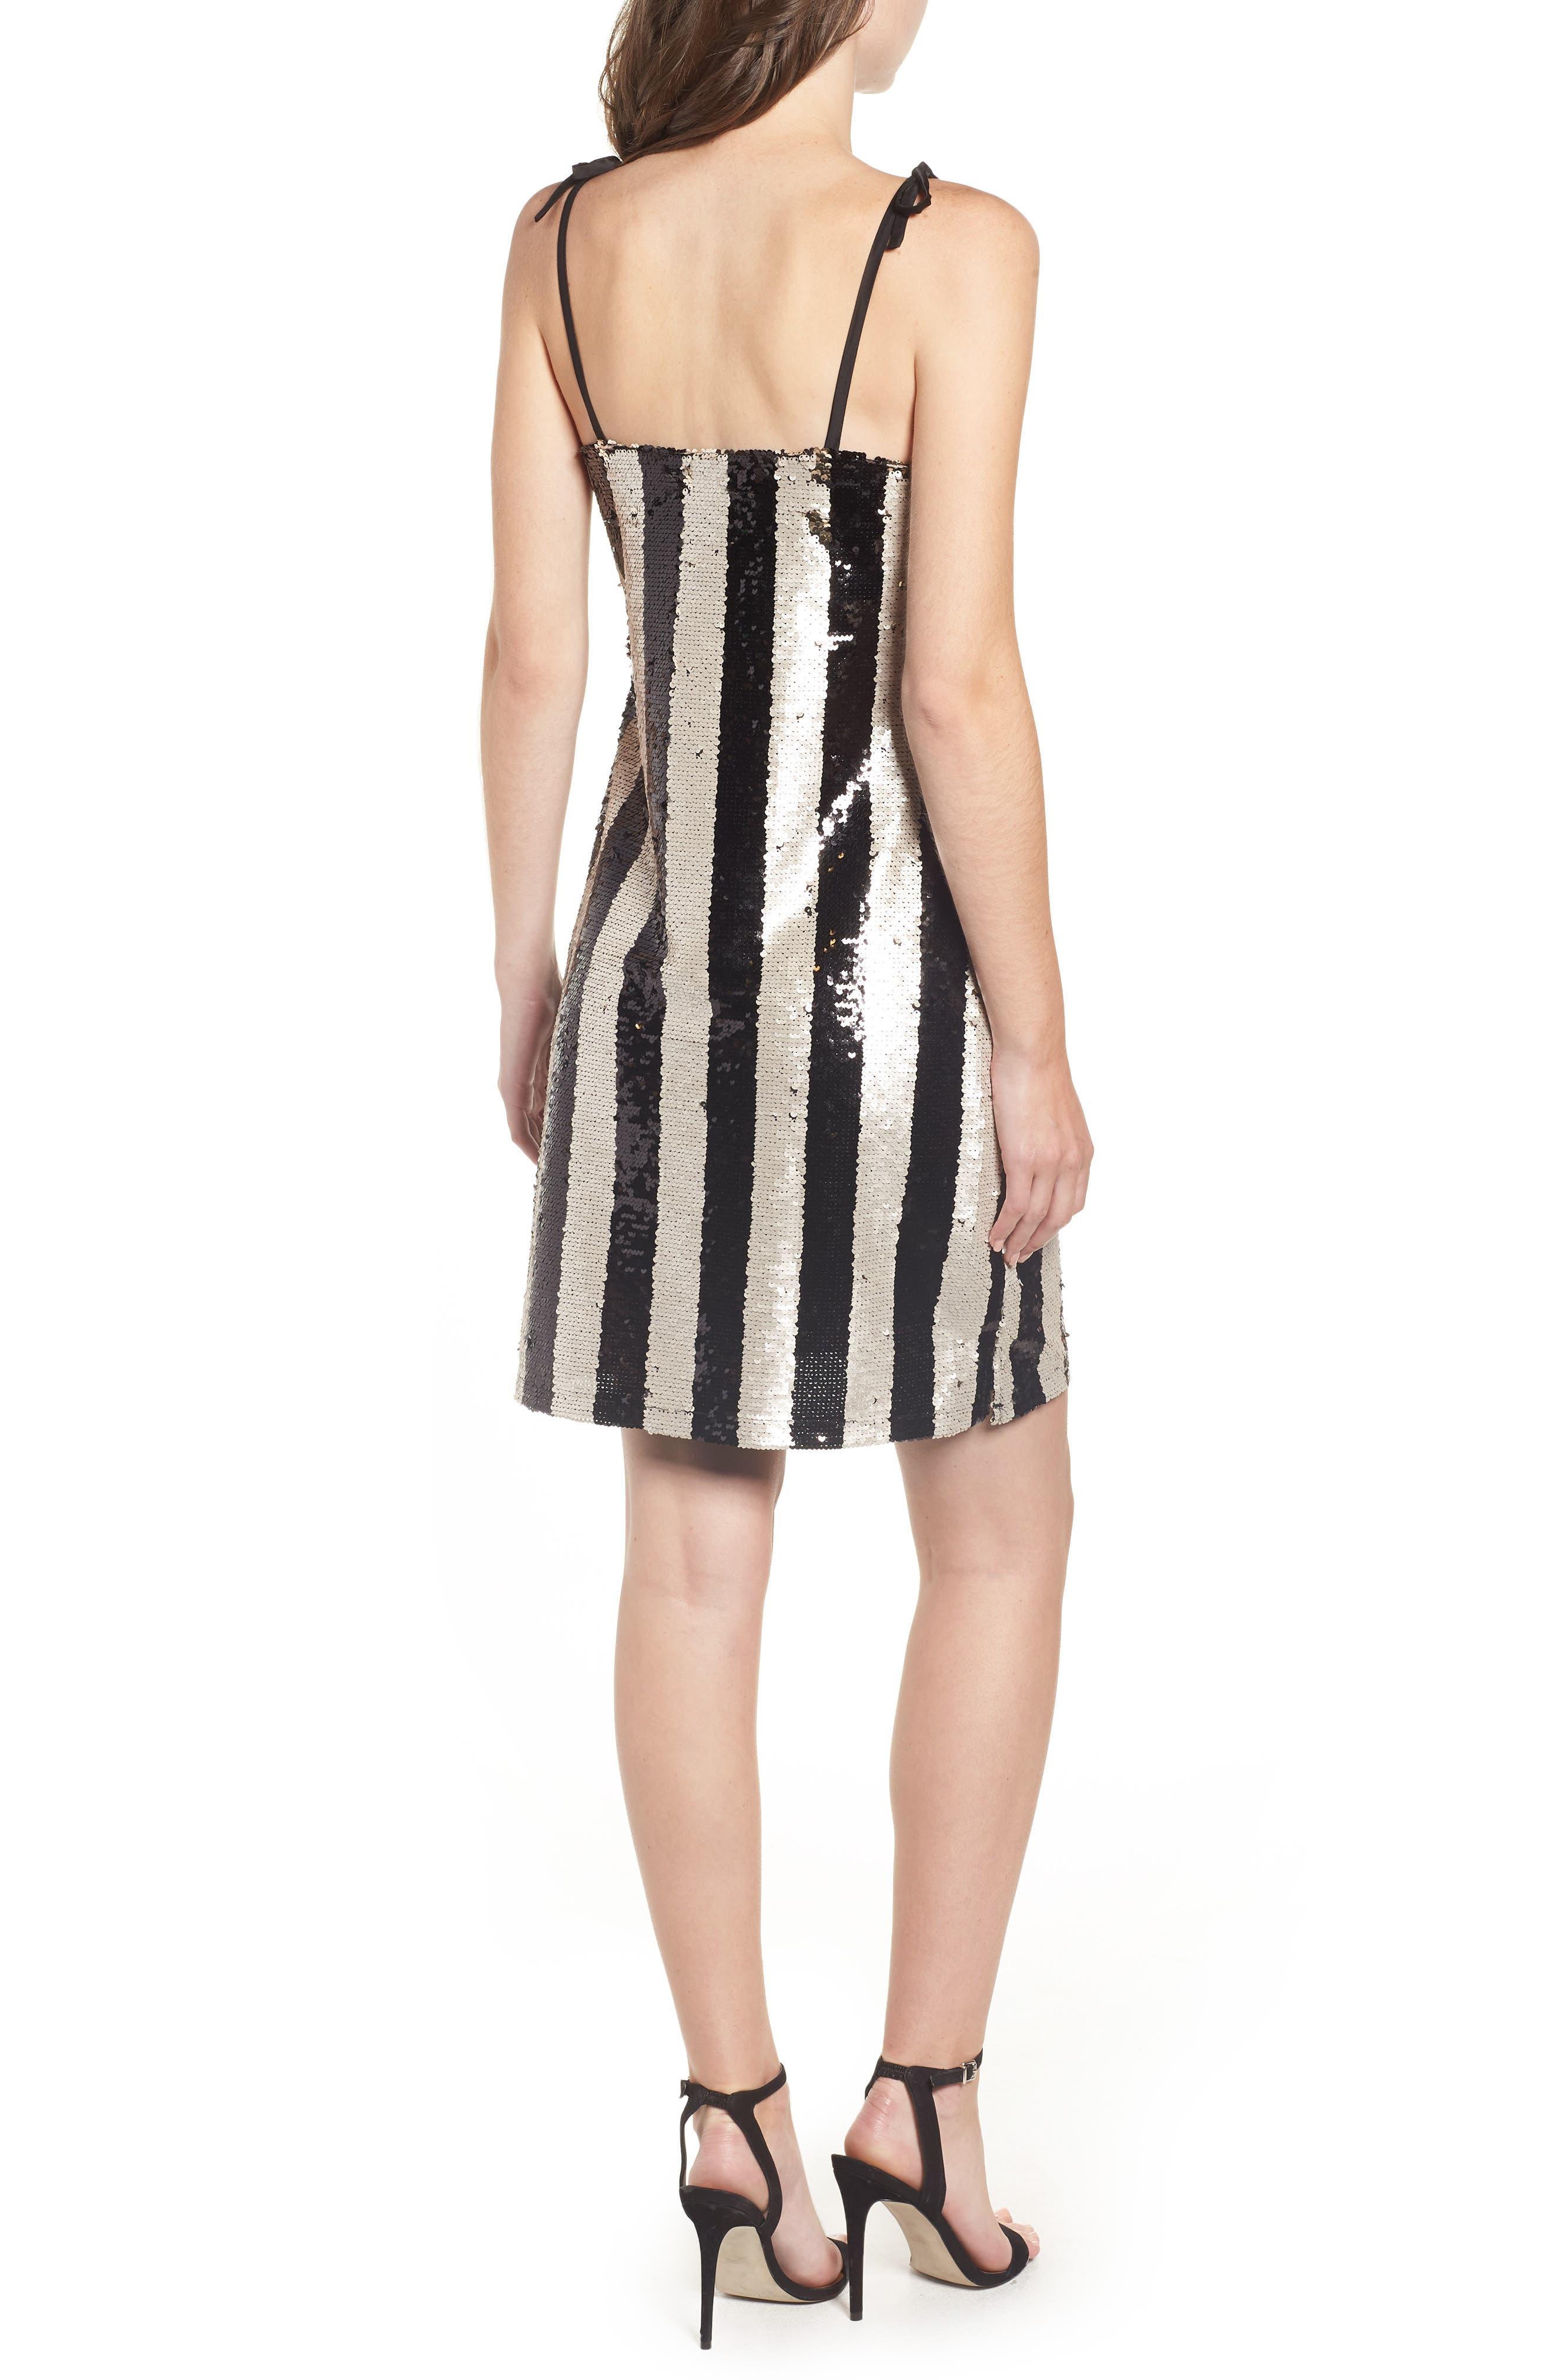 CUPCAKES AND CASHMERE, Vertical Sequin Stripe Dress, Alternate thumbnail 2, color, BLACK